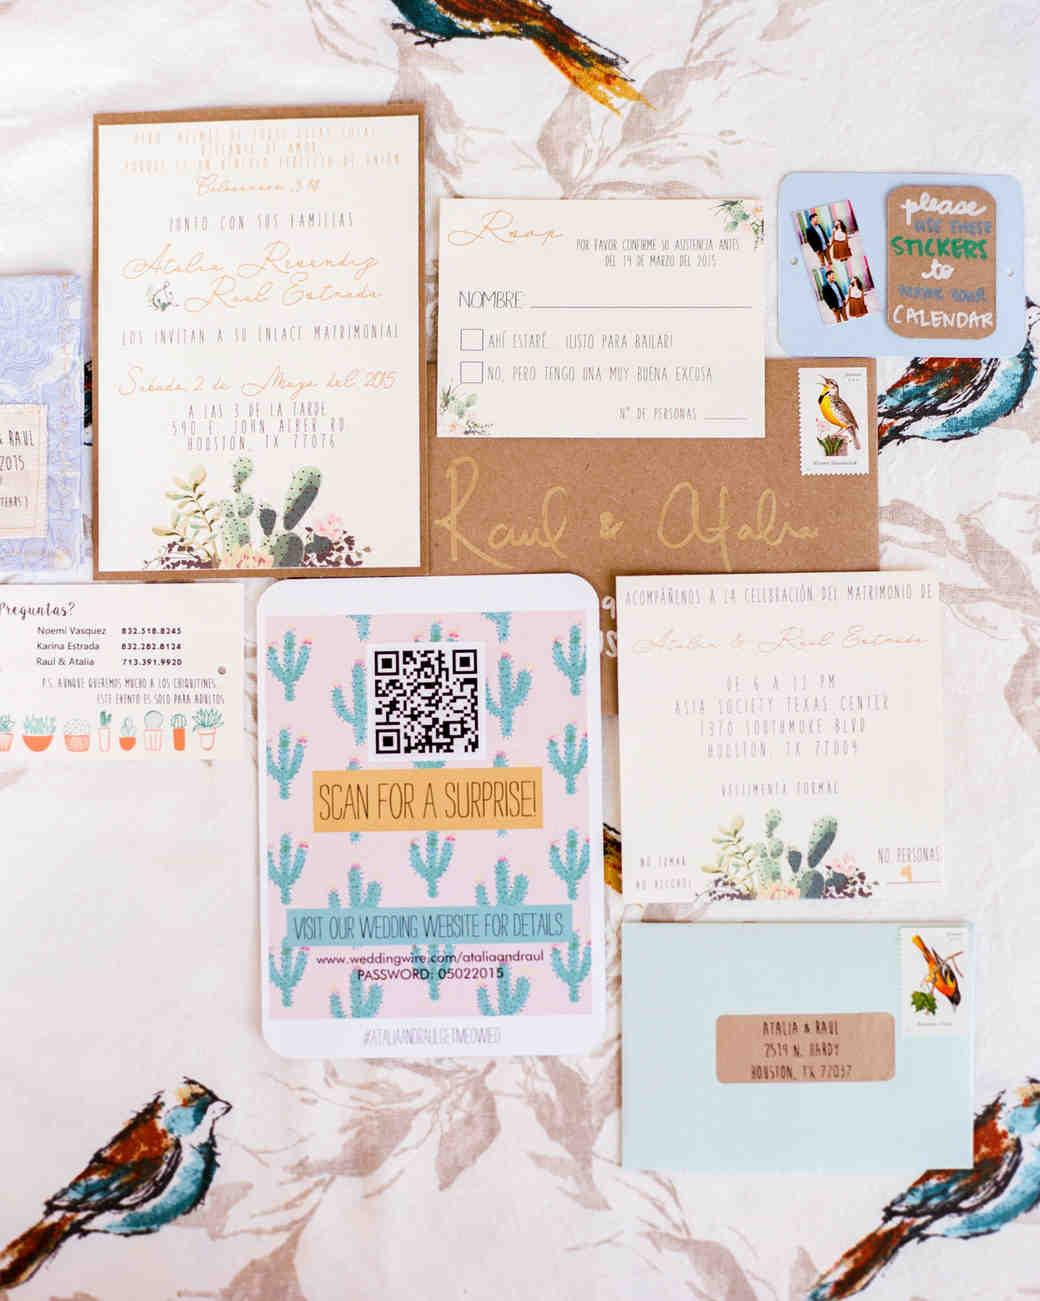 atalia-raul-wedding-stationery-2-s112395-1215.jpg